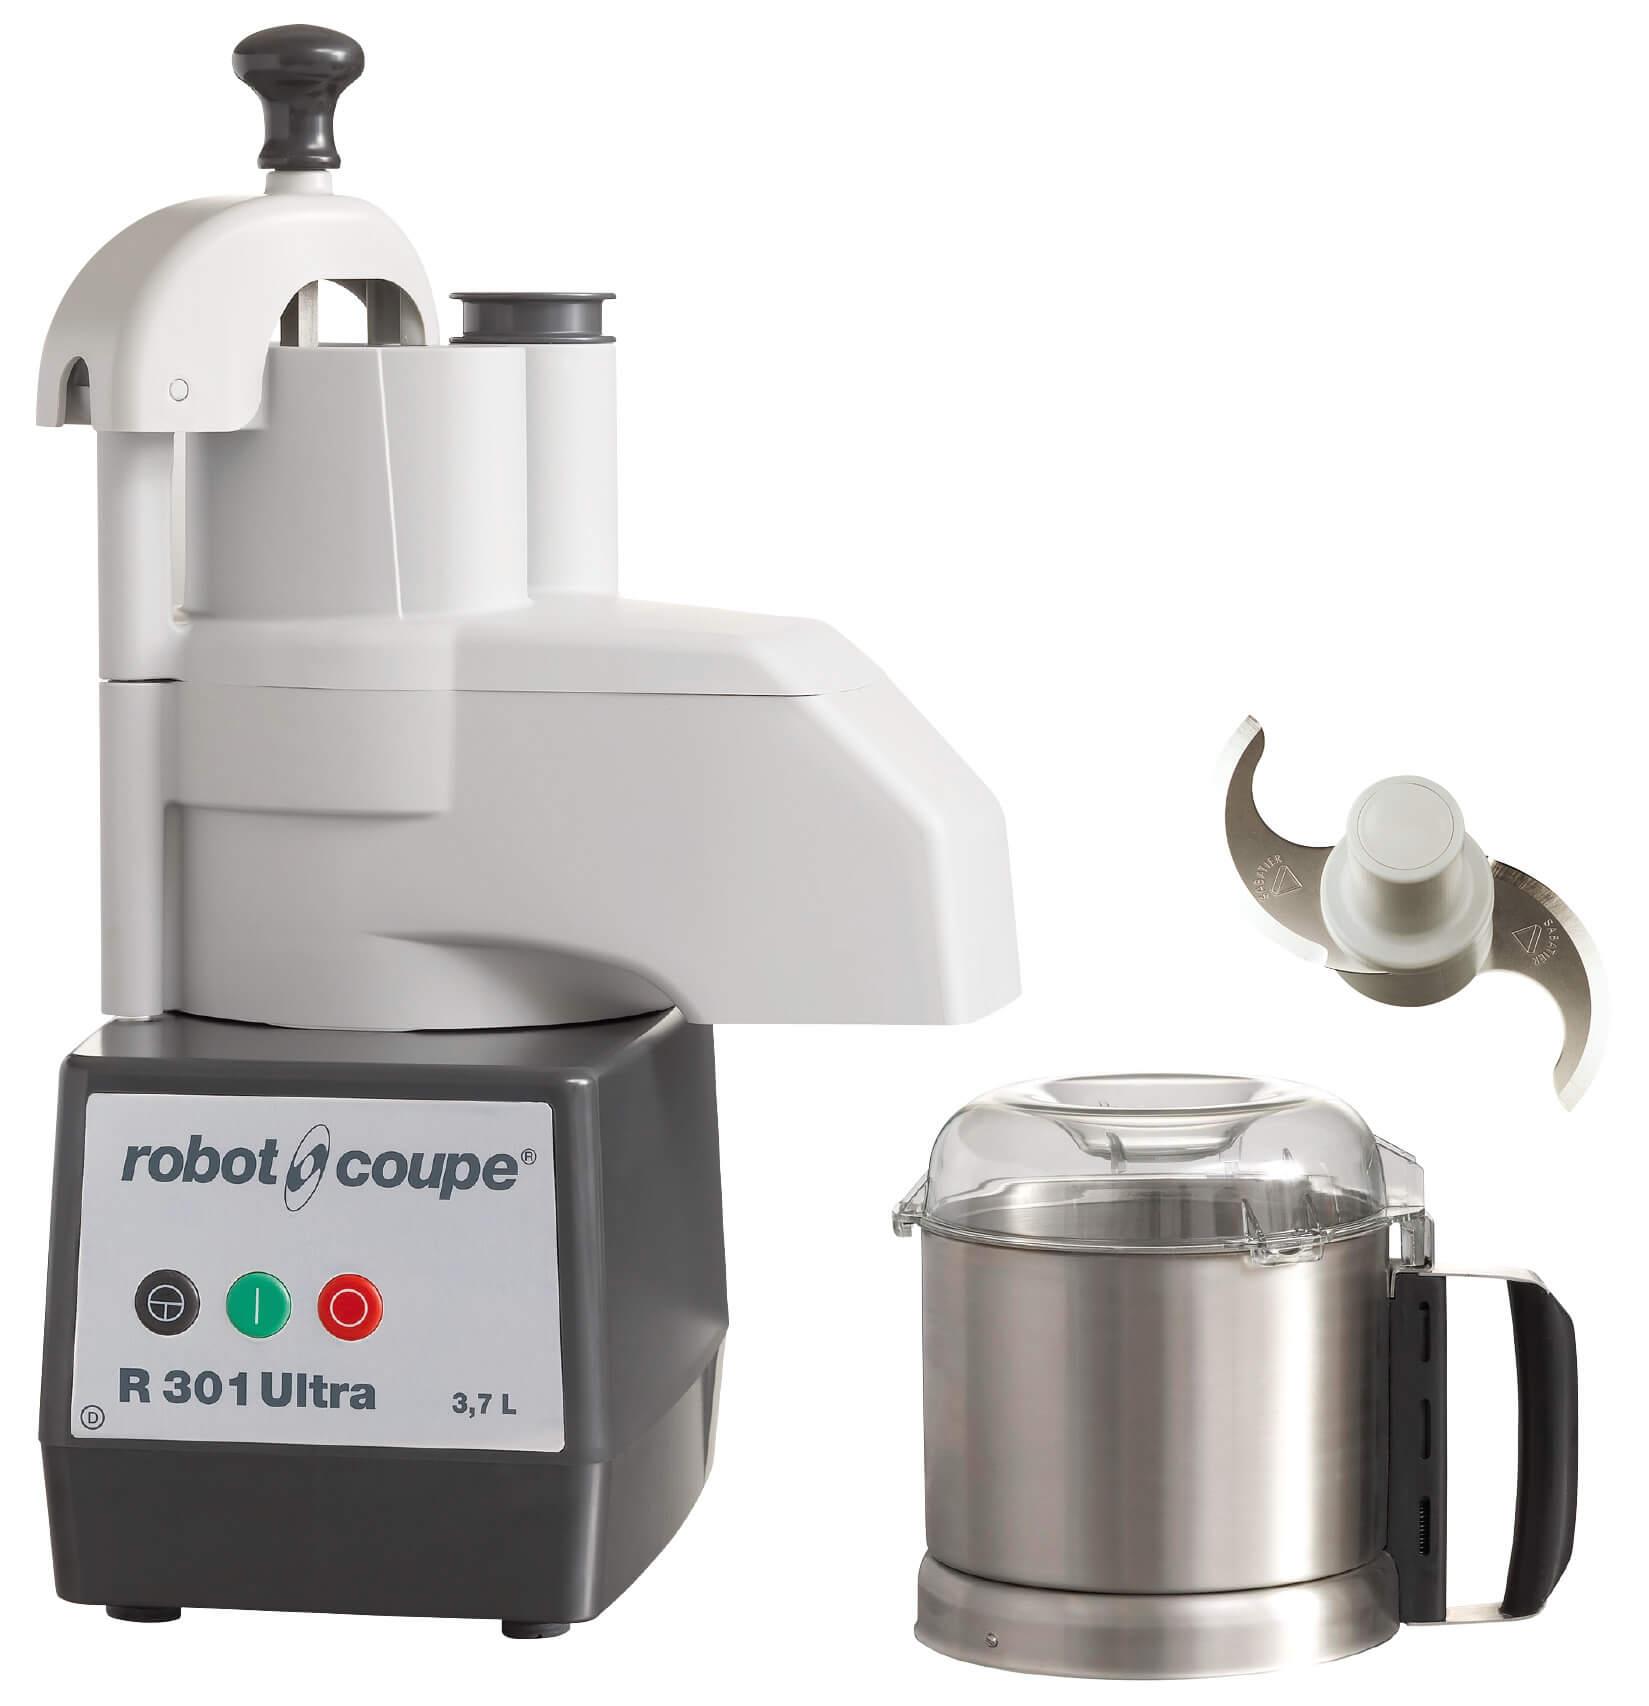 robot coupe R301 Ultra 多功能食物處理機